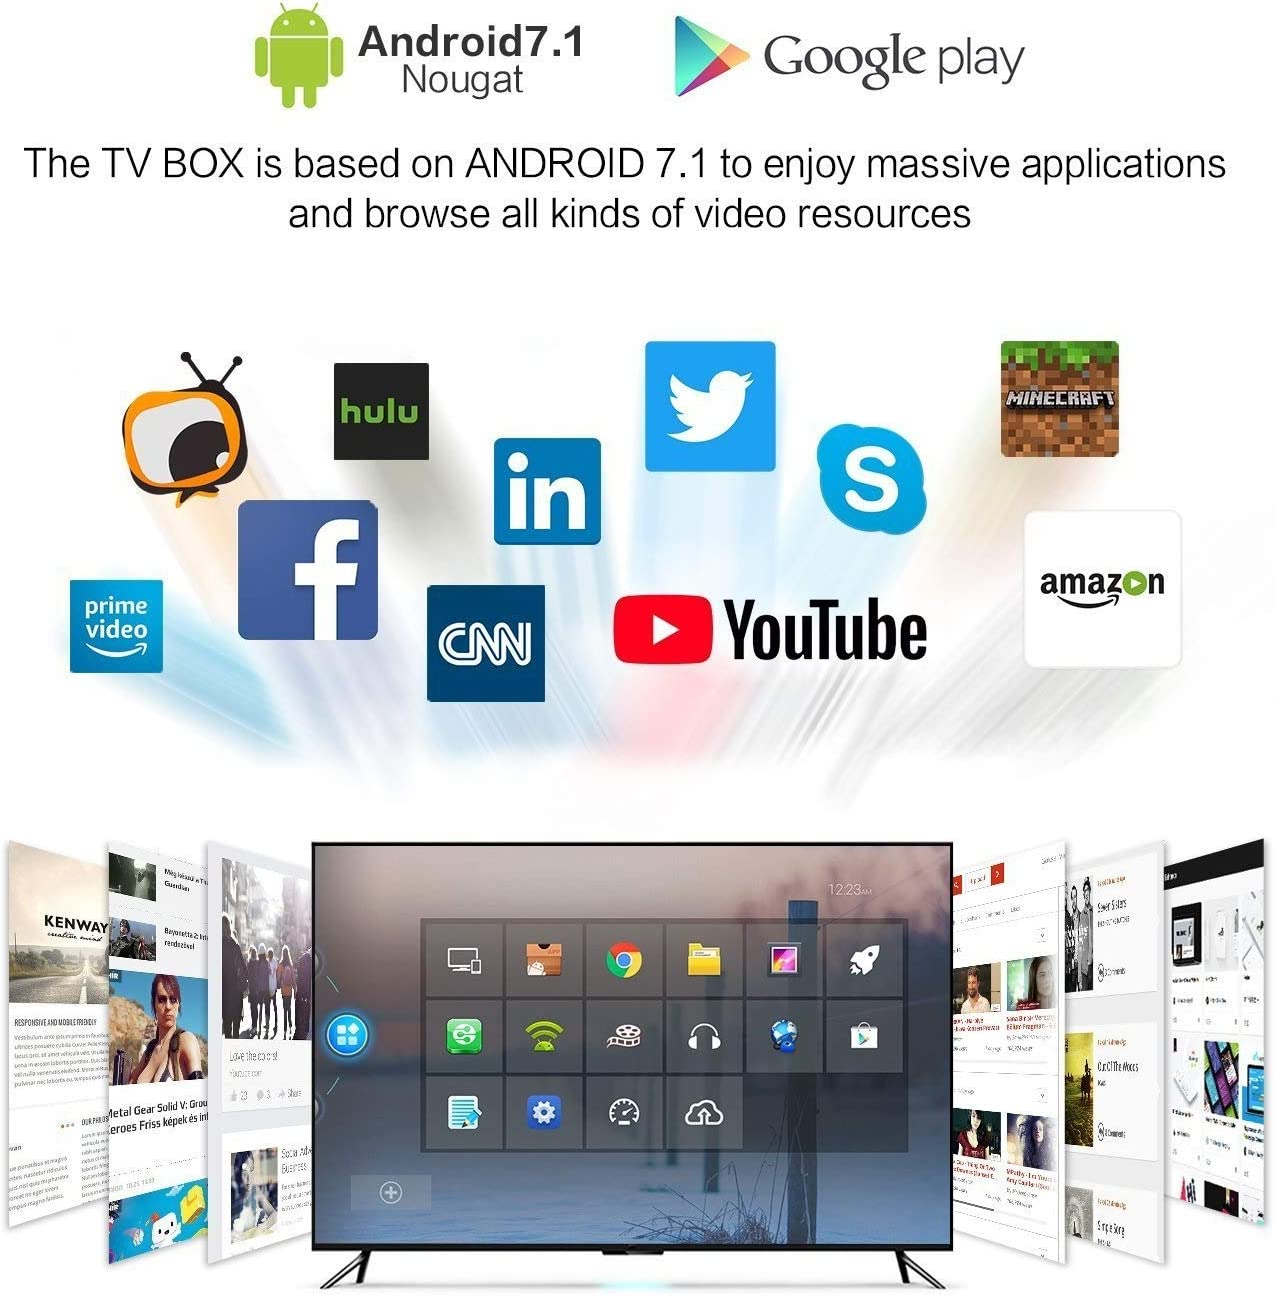 YOMRIC Android TV Box - Android 7.1 Smart TV Boxsets, Amlogic S905X de Cuatro núcleos, 2GB de RAM y 16GB de ROM, 4K @ 60fps Ultra HD, codificador de Video de Soporte